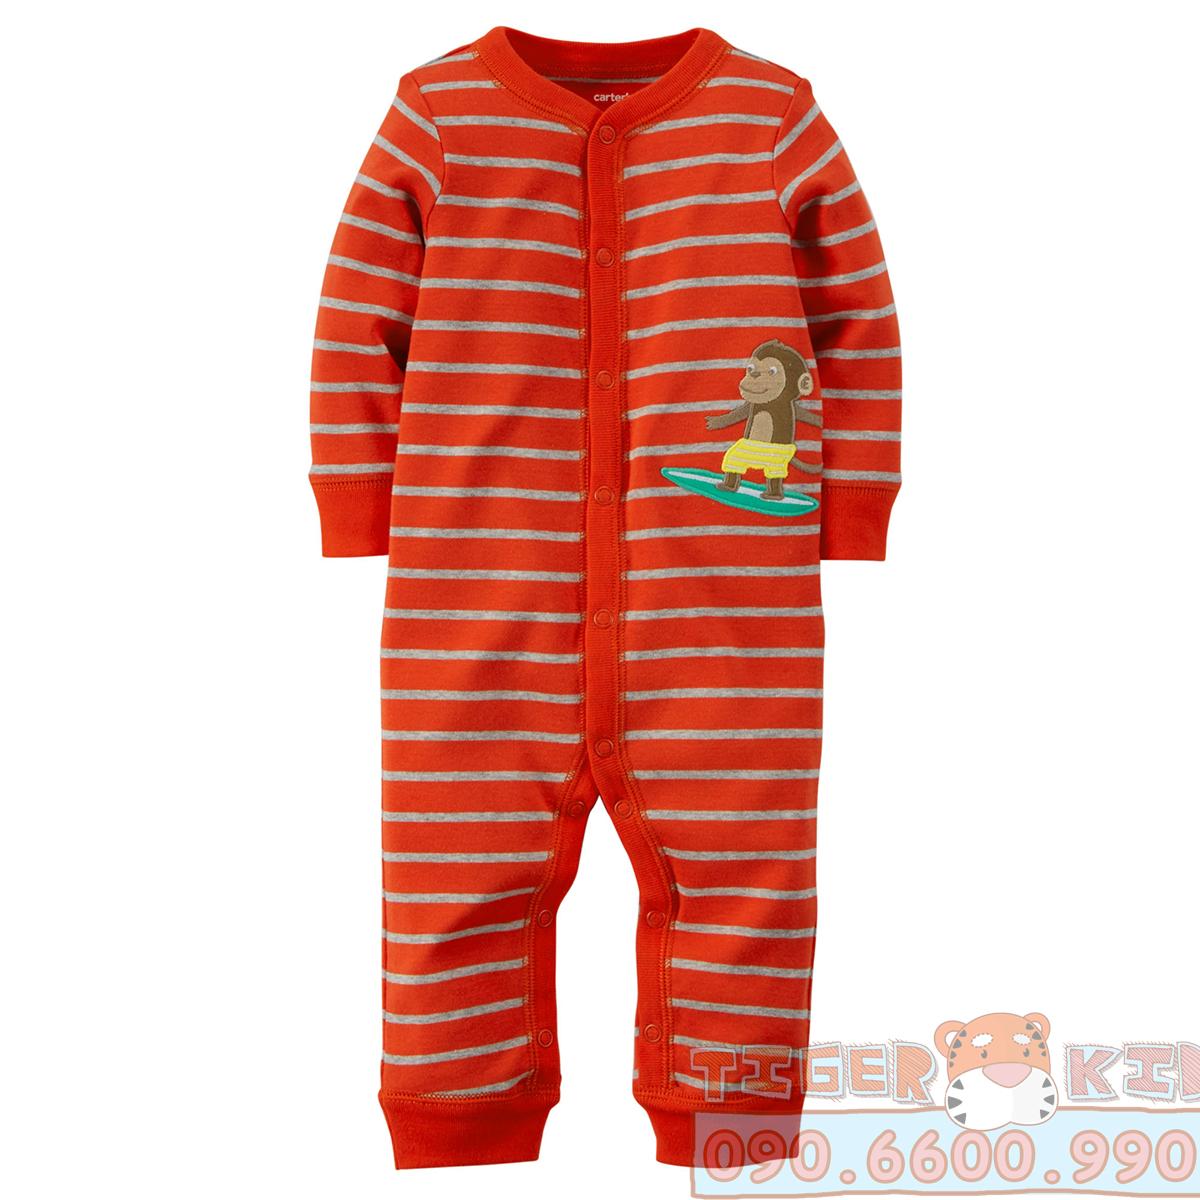 30896896596 2fc5e86bd0 o Sleepsuit nhập Mỹ size 6M;9M